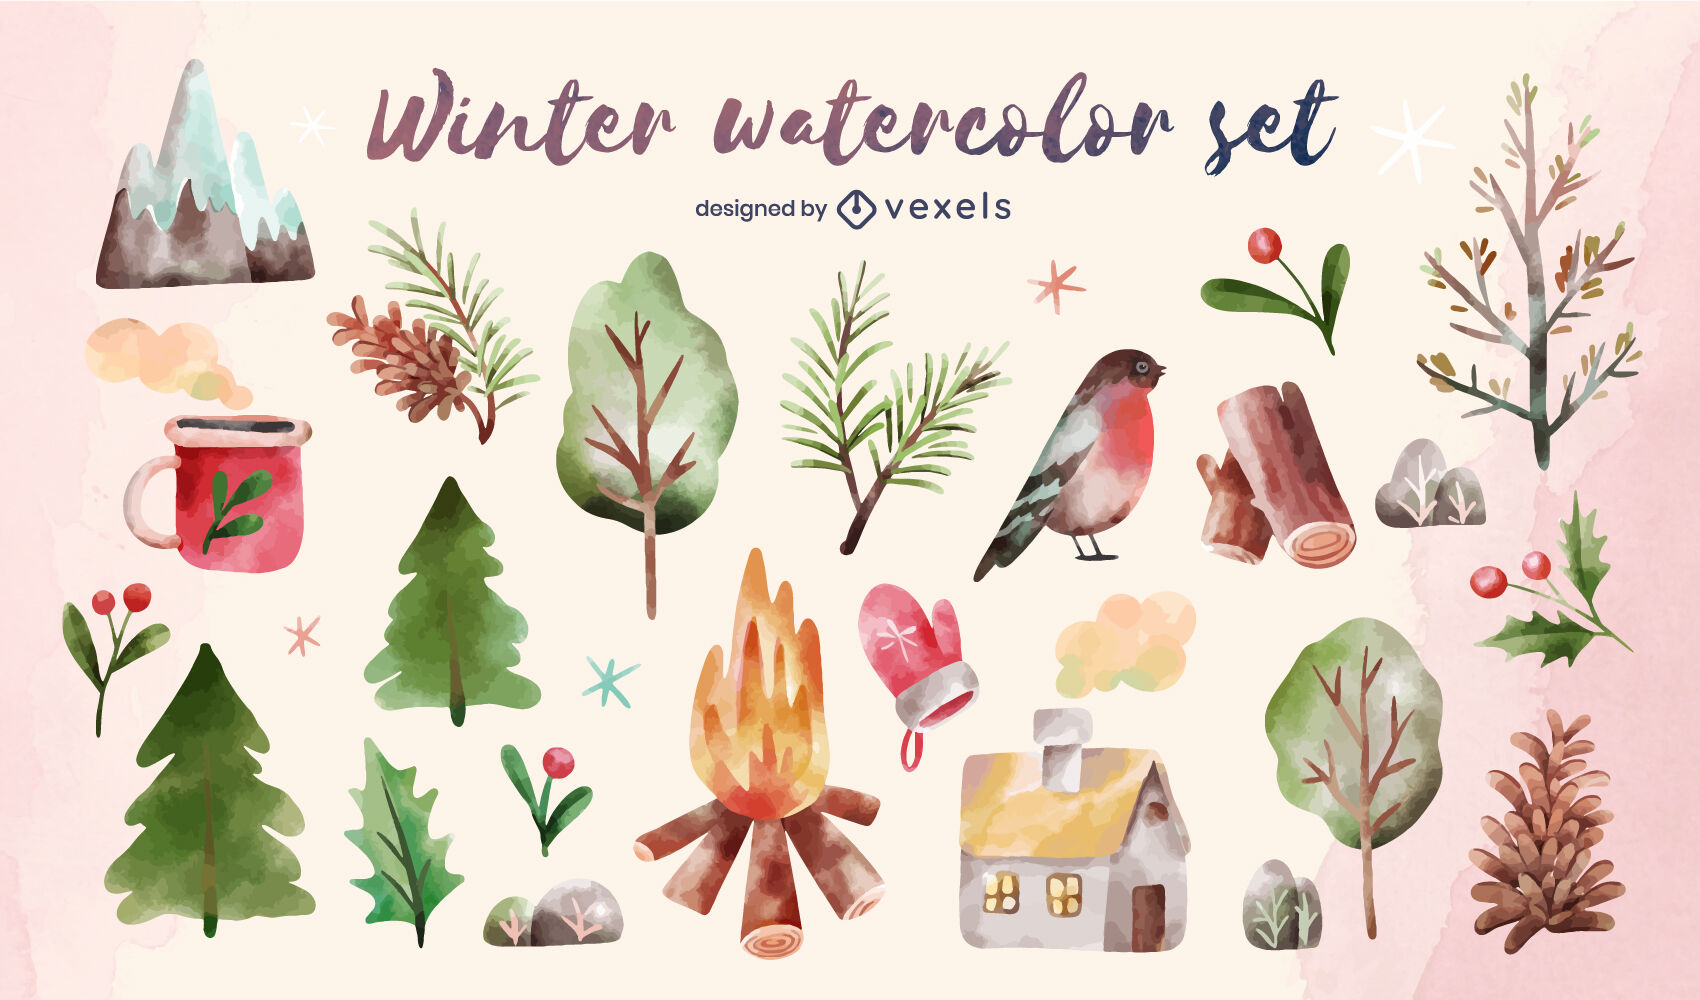 Winter Naturelemente Aquarell-Set